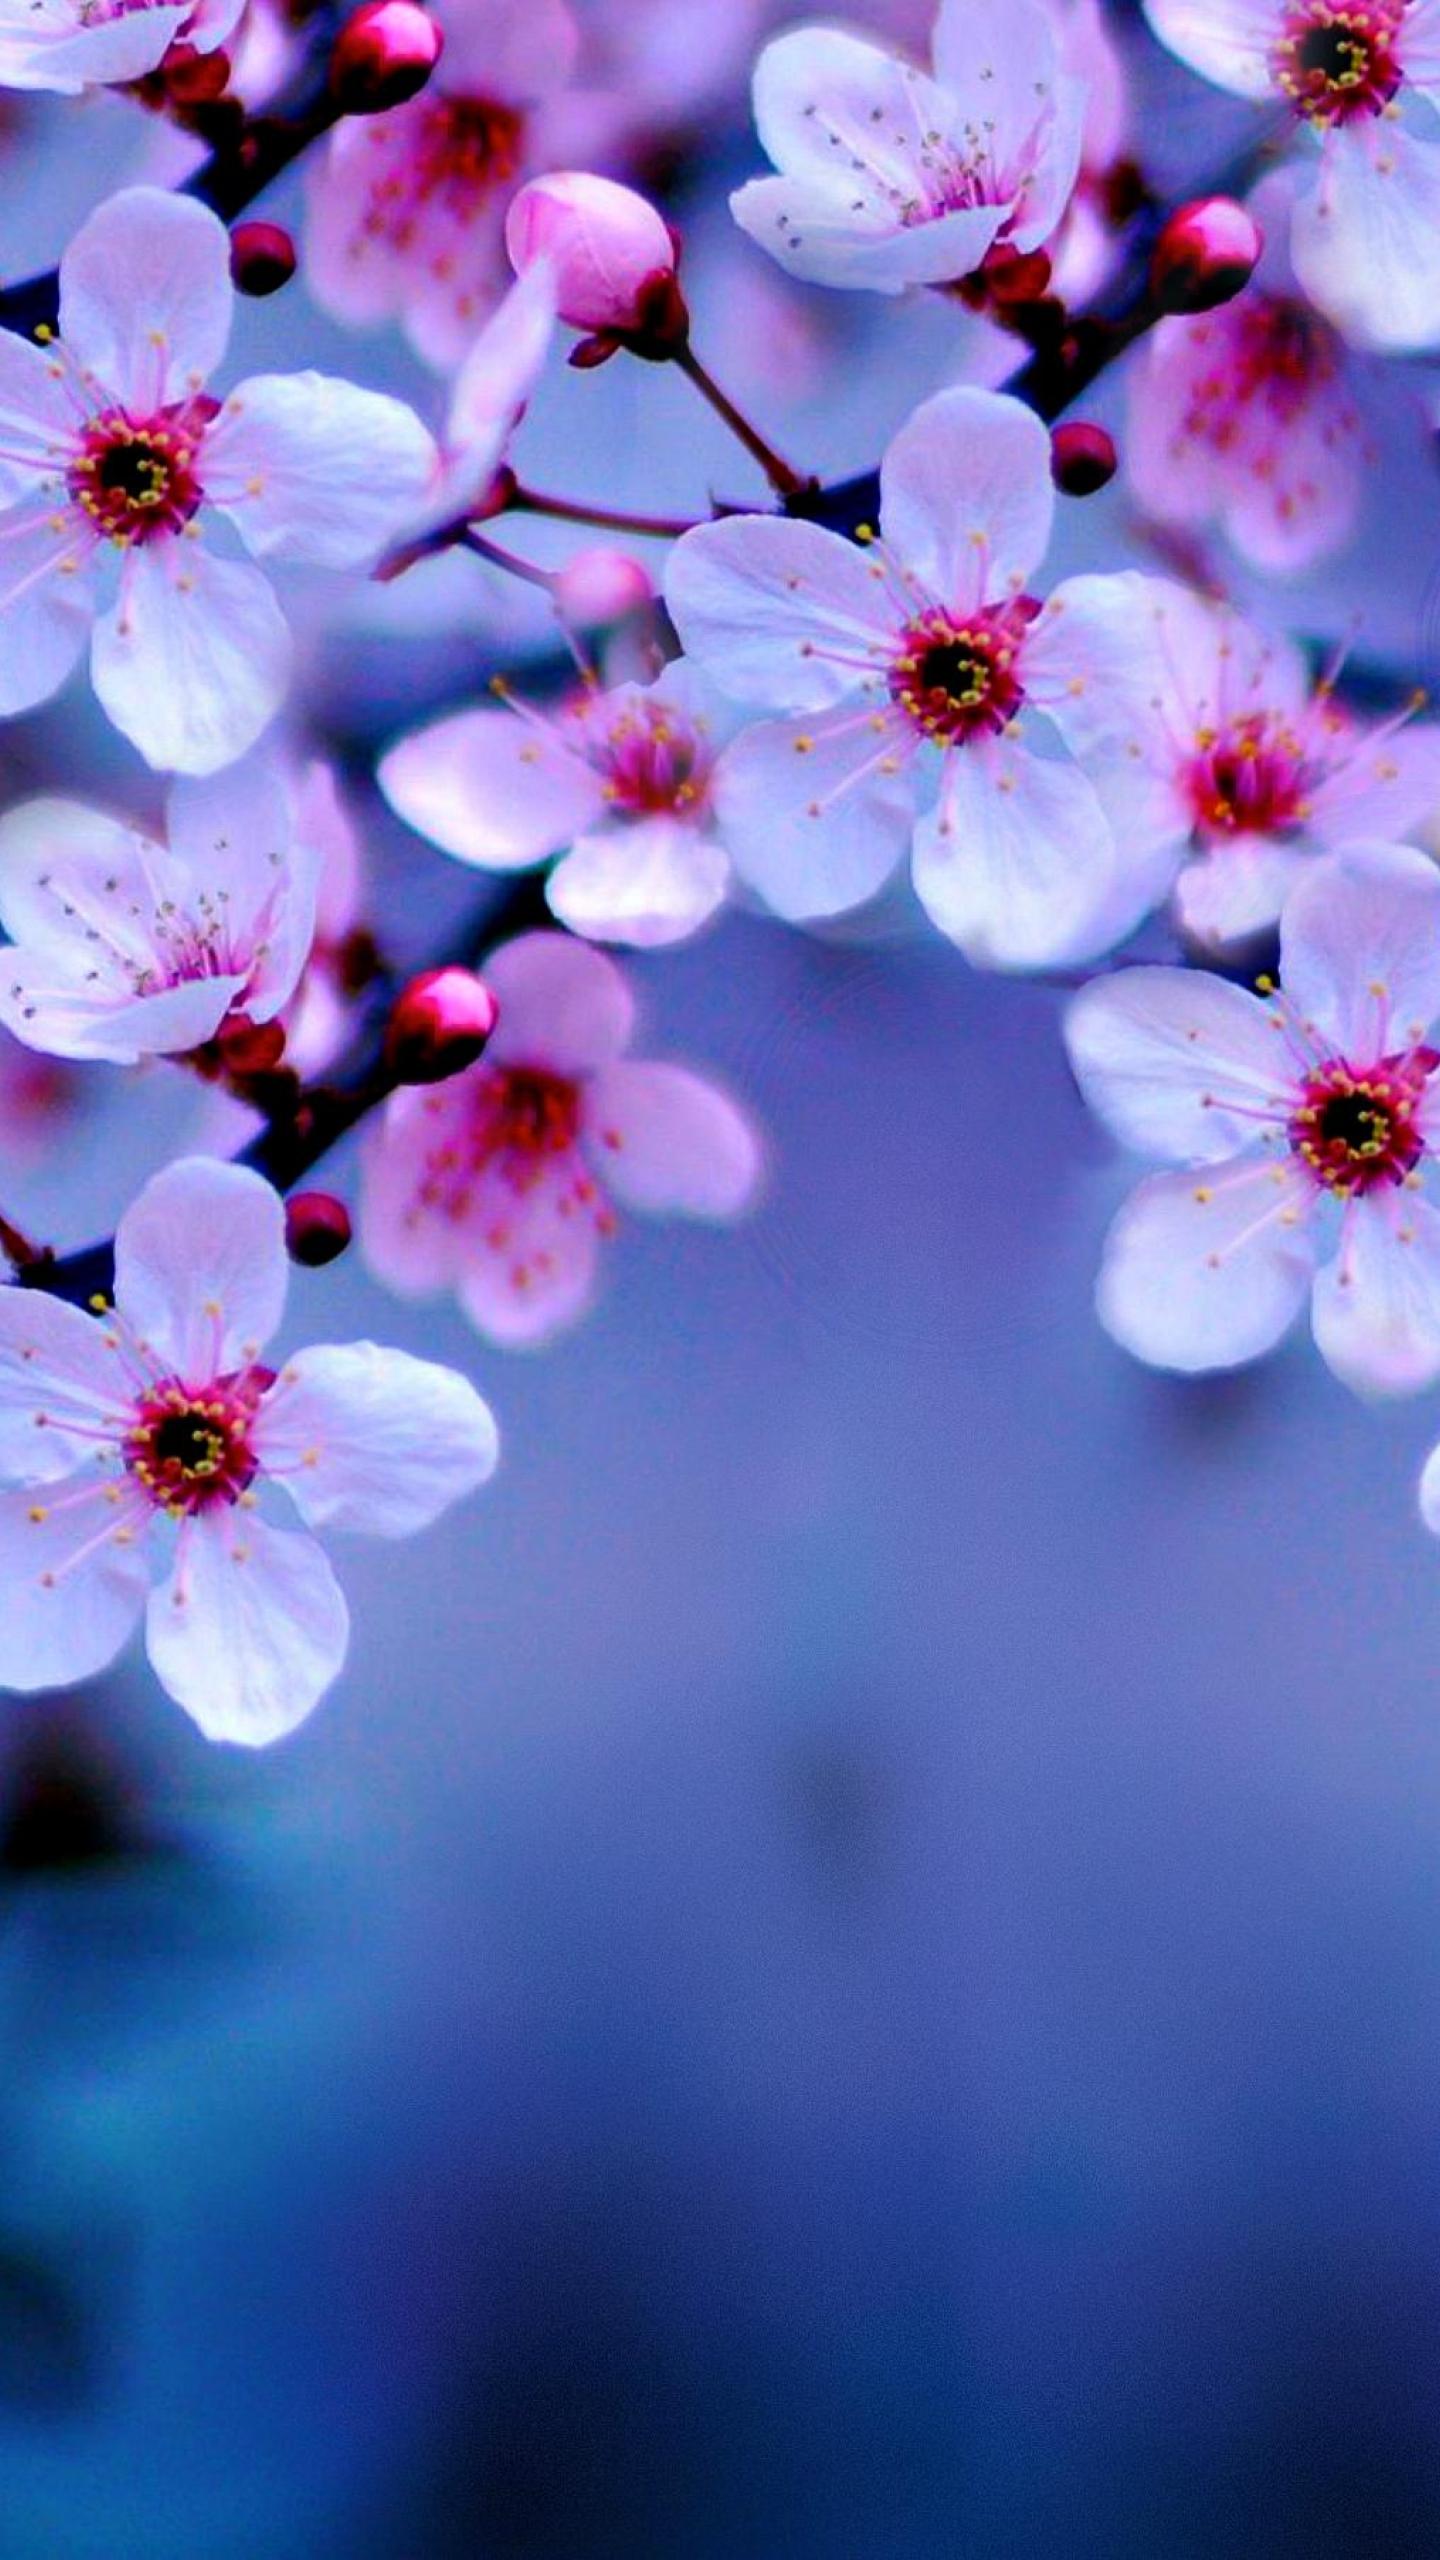 download cherry blossom 1440x2560 resolution hd 4k wallpaper. Black Bedroom Furniture Sets. Home Design Ideas